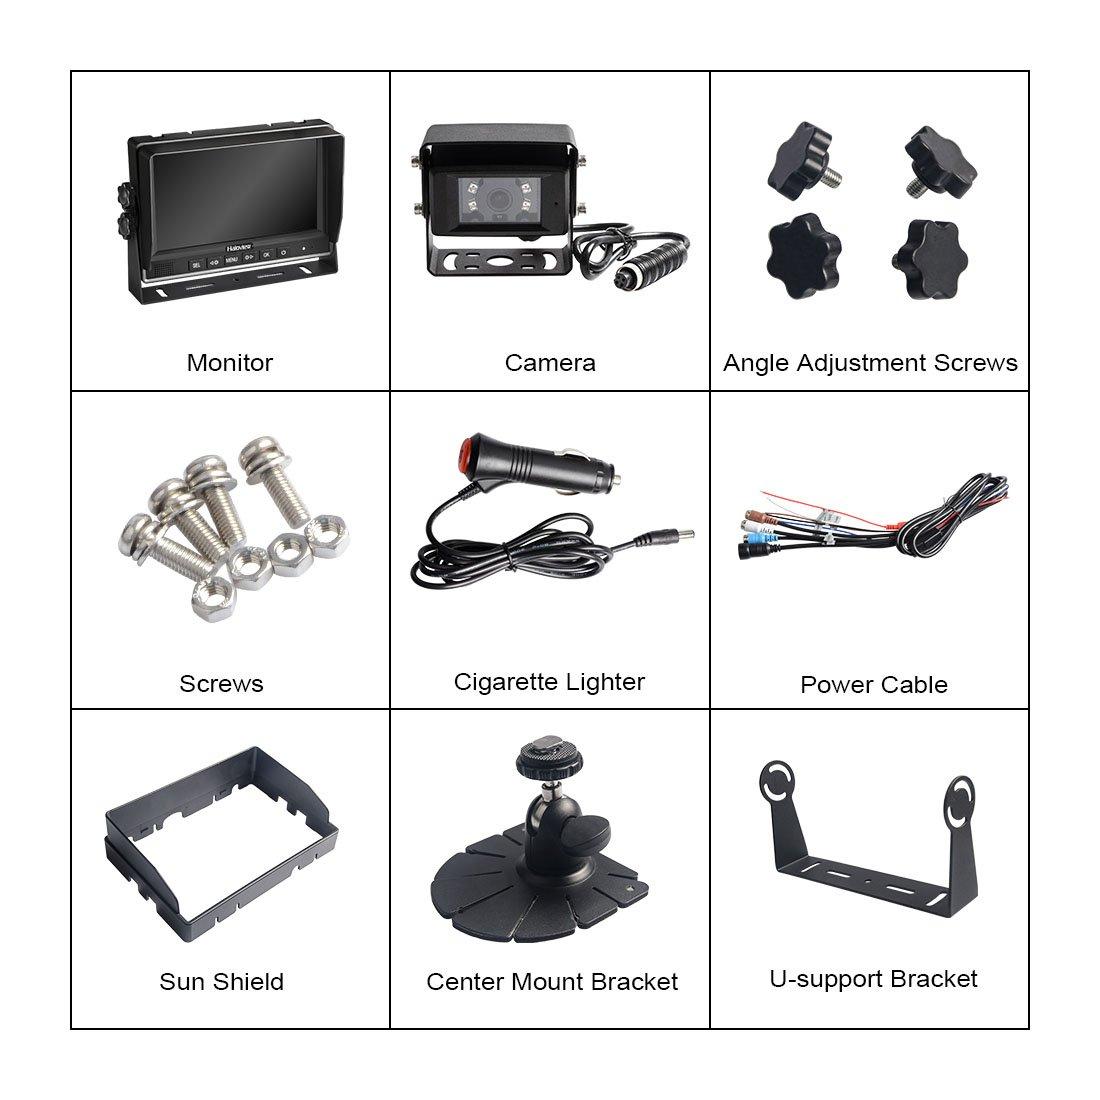 MC7601 Haloview MC7601 Backup Camera System Kit 7 LCD Reversing Monitor and IP69K Waterproof Rear View Camera for Truck//Trailer//Bus//RV//Pickups//Camper//Van//Farm Machine Car Wolfwhoop 5558990295